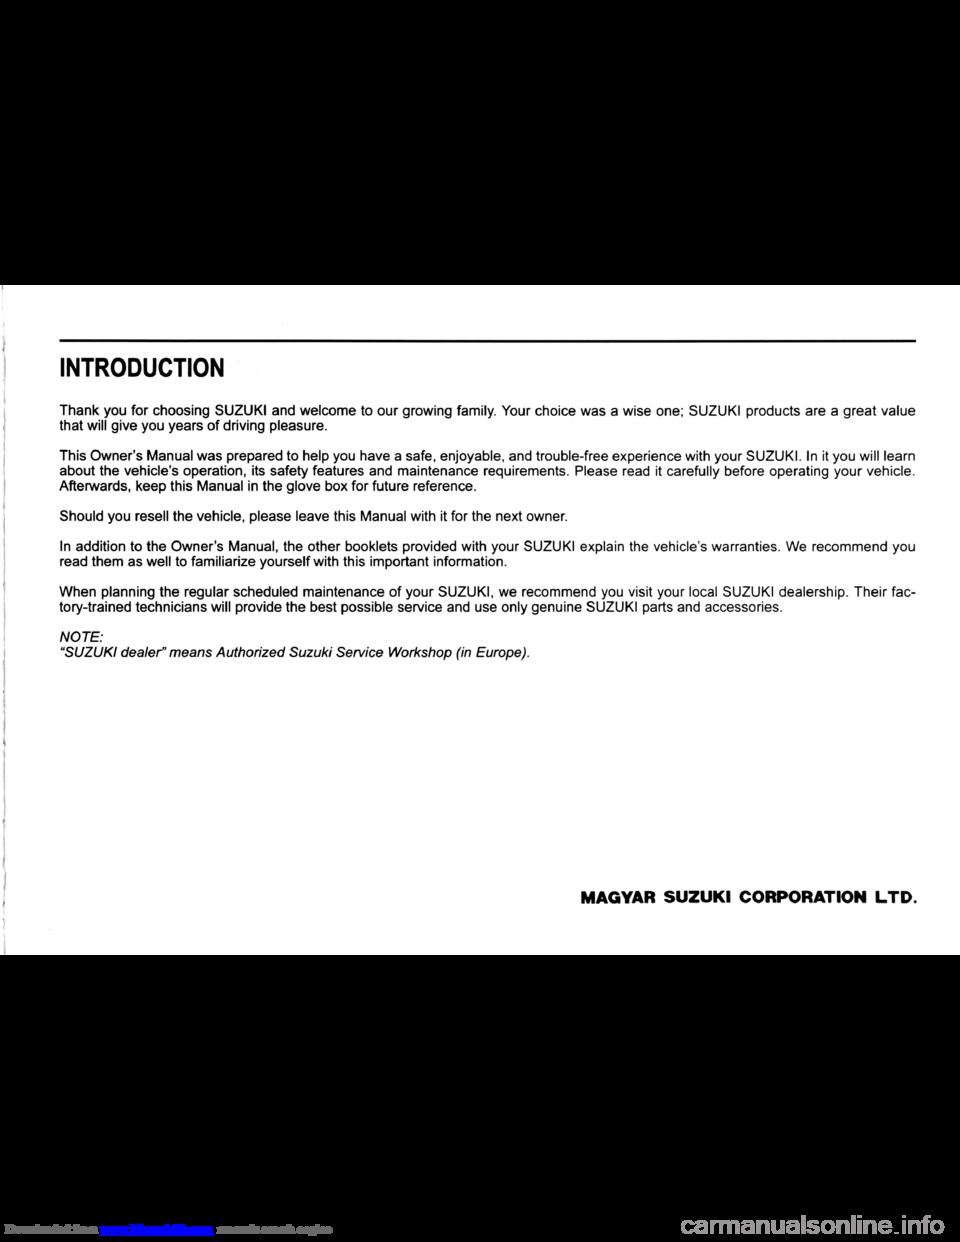 suzuki swift 2005 2.g owners manual